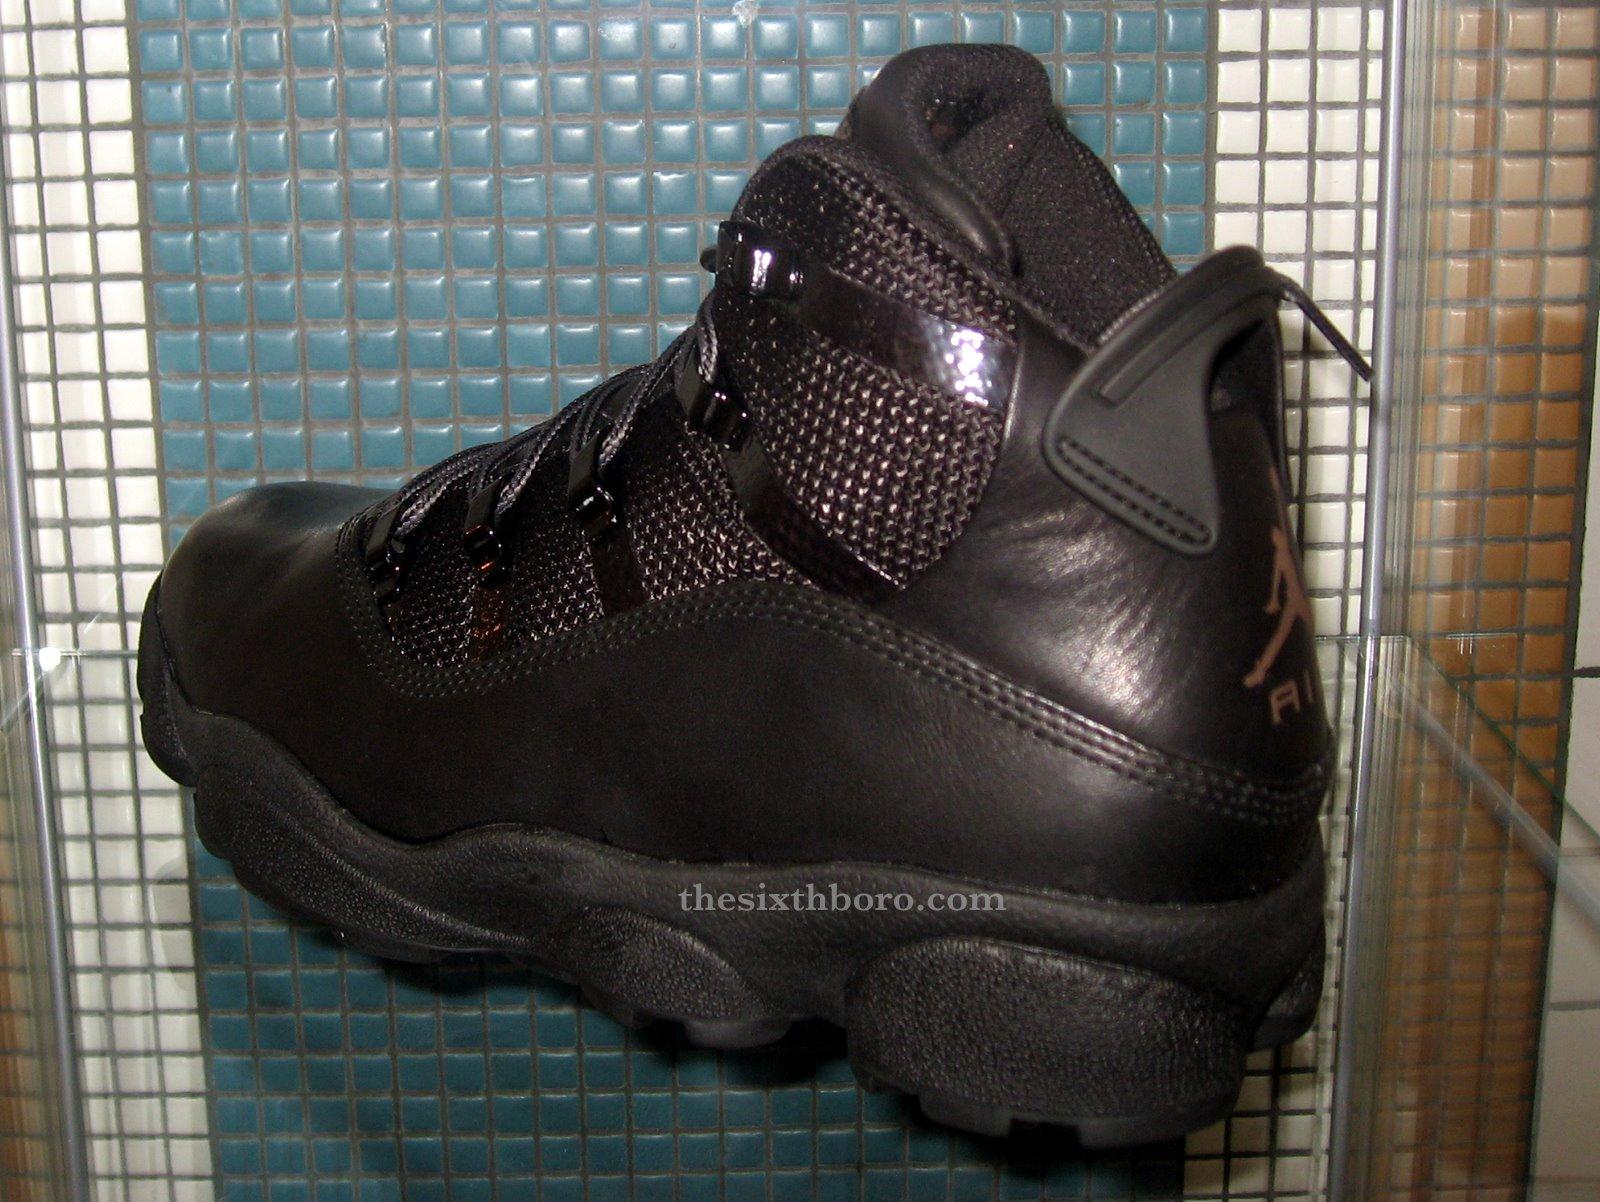 65eff630f6002 Color  Black Rustic Style  414845-001